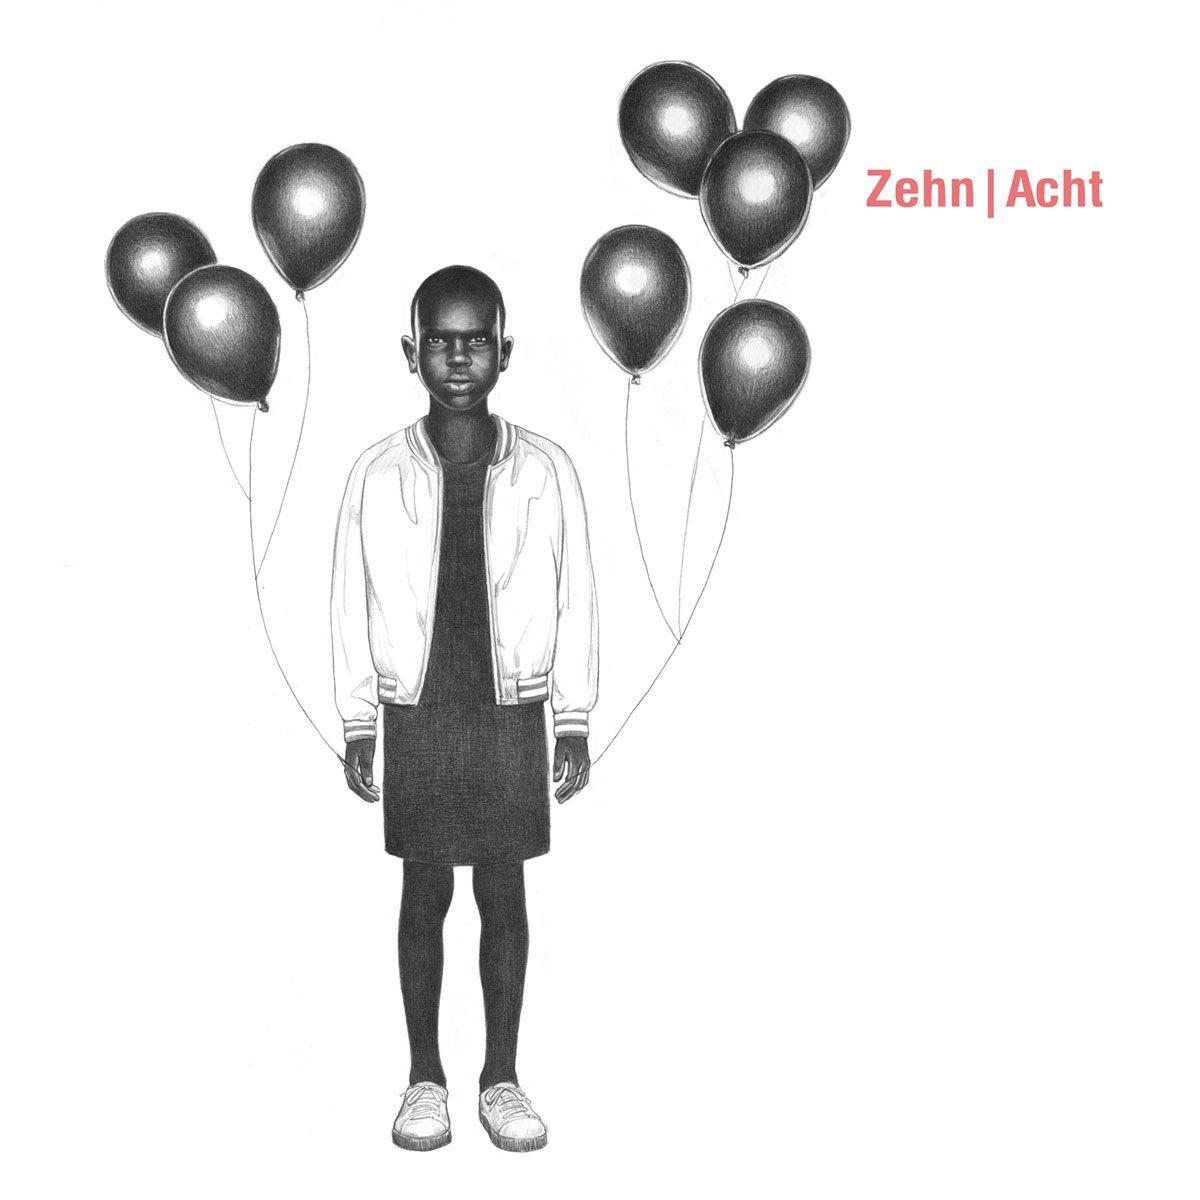 Ostgut Ton Zehn 10 12 Vinyl 3xcd Hardcover Box Ostgut Ton Zehn Dengan Gambar